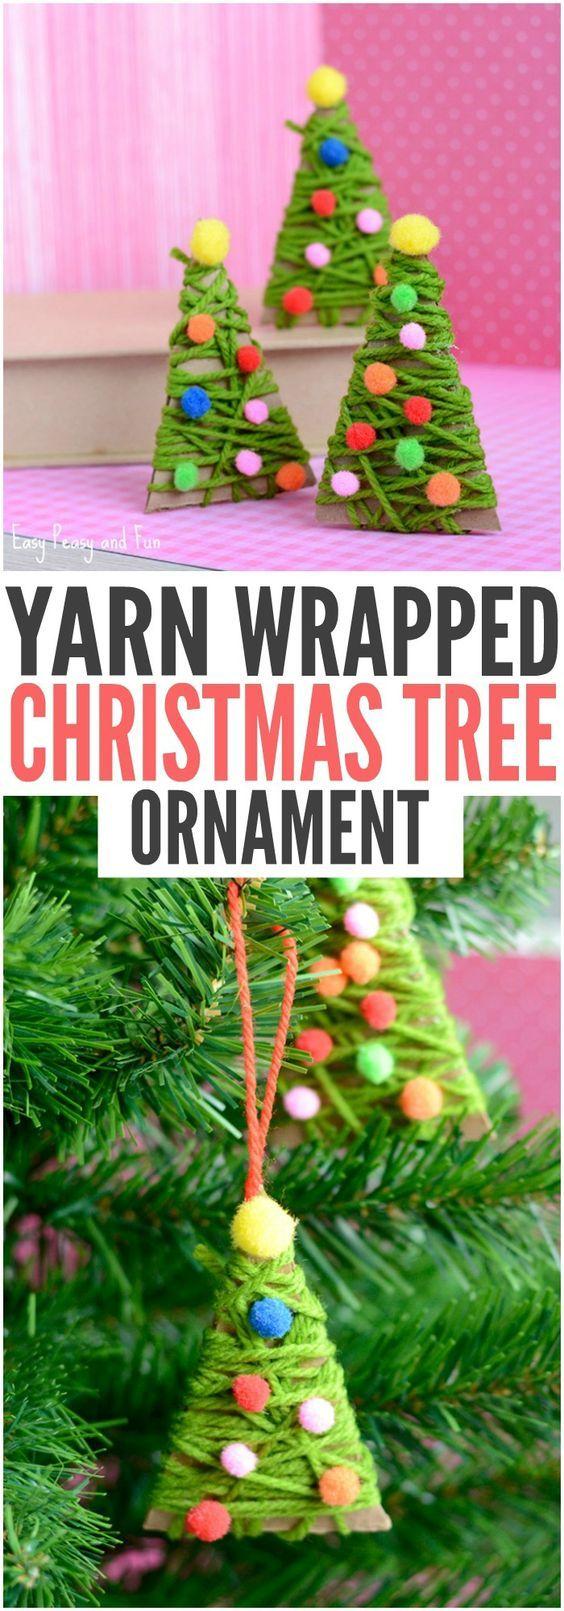 Yarn Wrapped Christmas Tree Ornaments Manualidades Navidenas Navidad Preescolar Adornos Navidenos